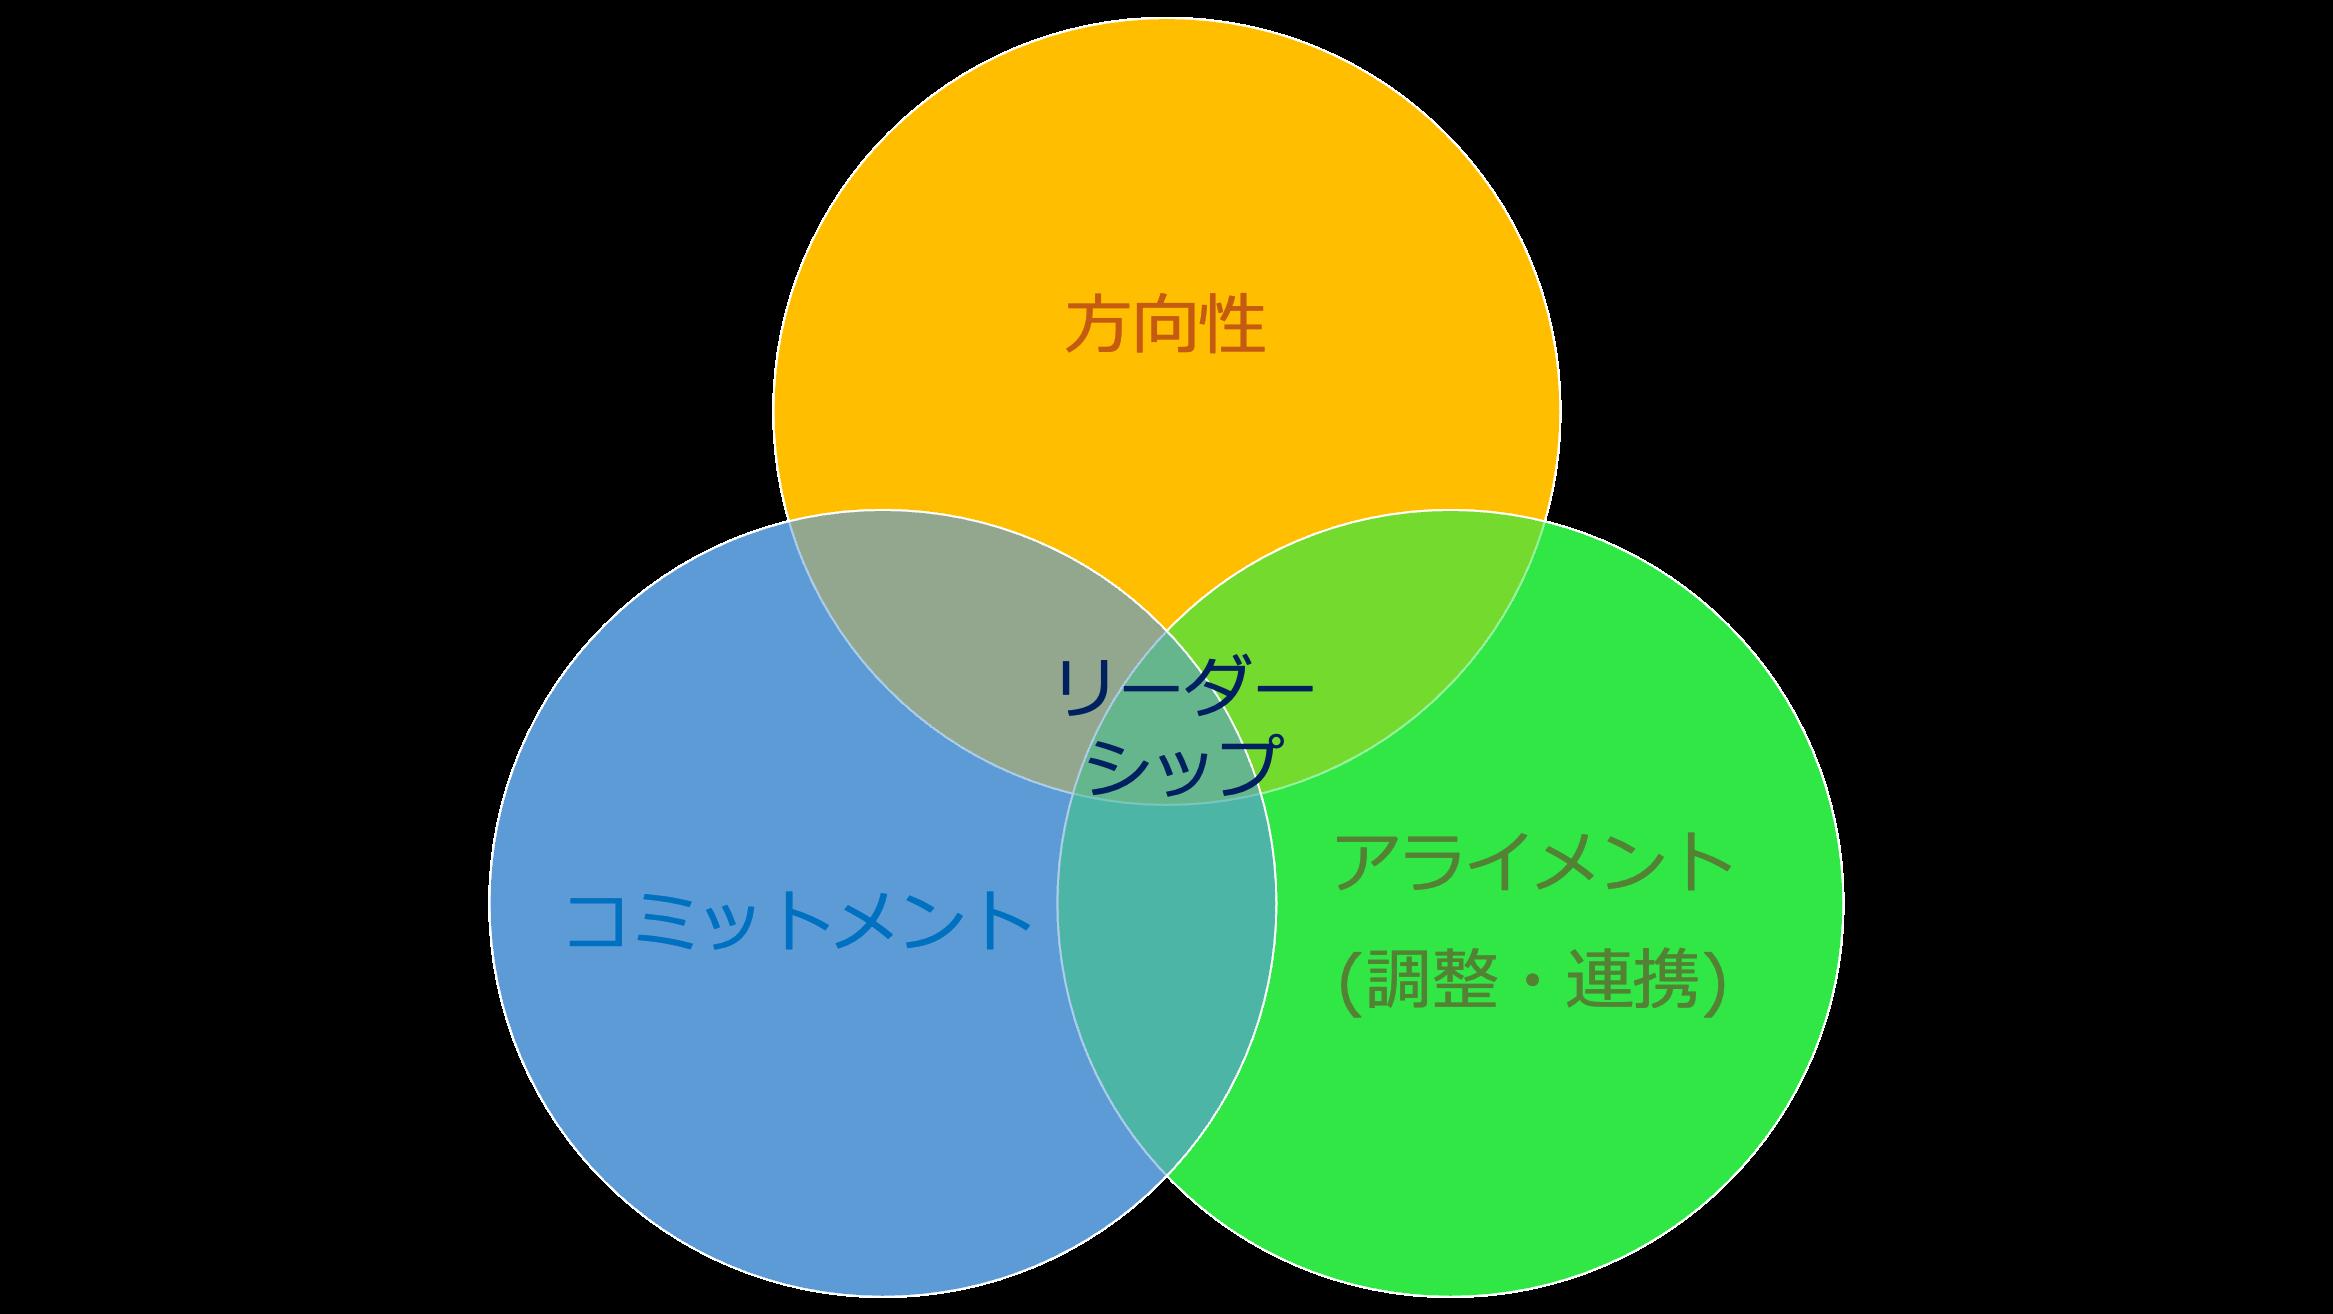 DAC フレームワーク CCL